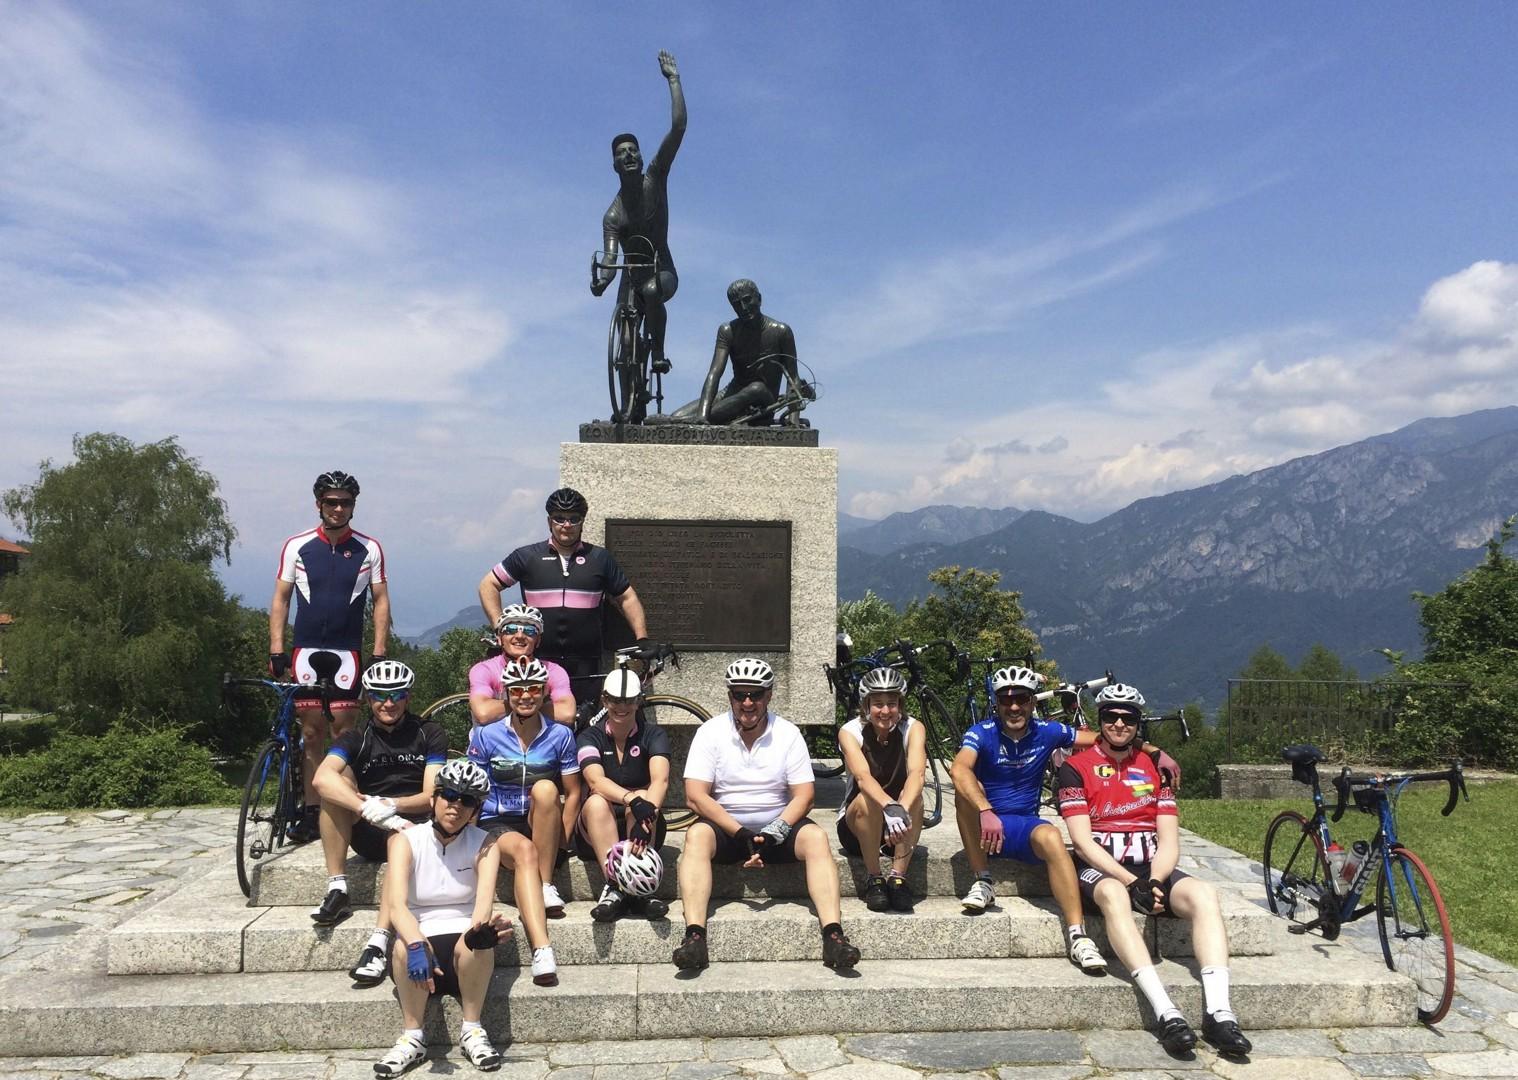 lombardia13.jpg - Italy - Lakes of Lombardia - Guided Road Cycling Holiday - Italia Road Cycling